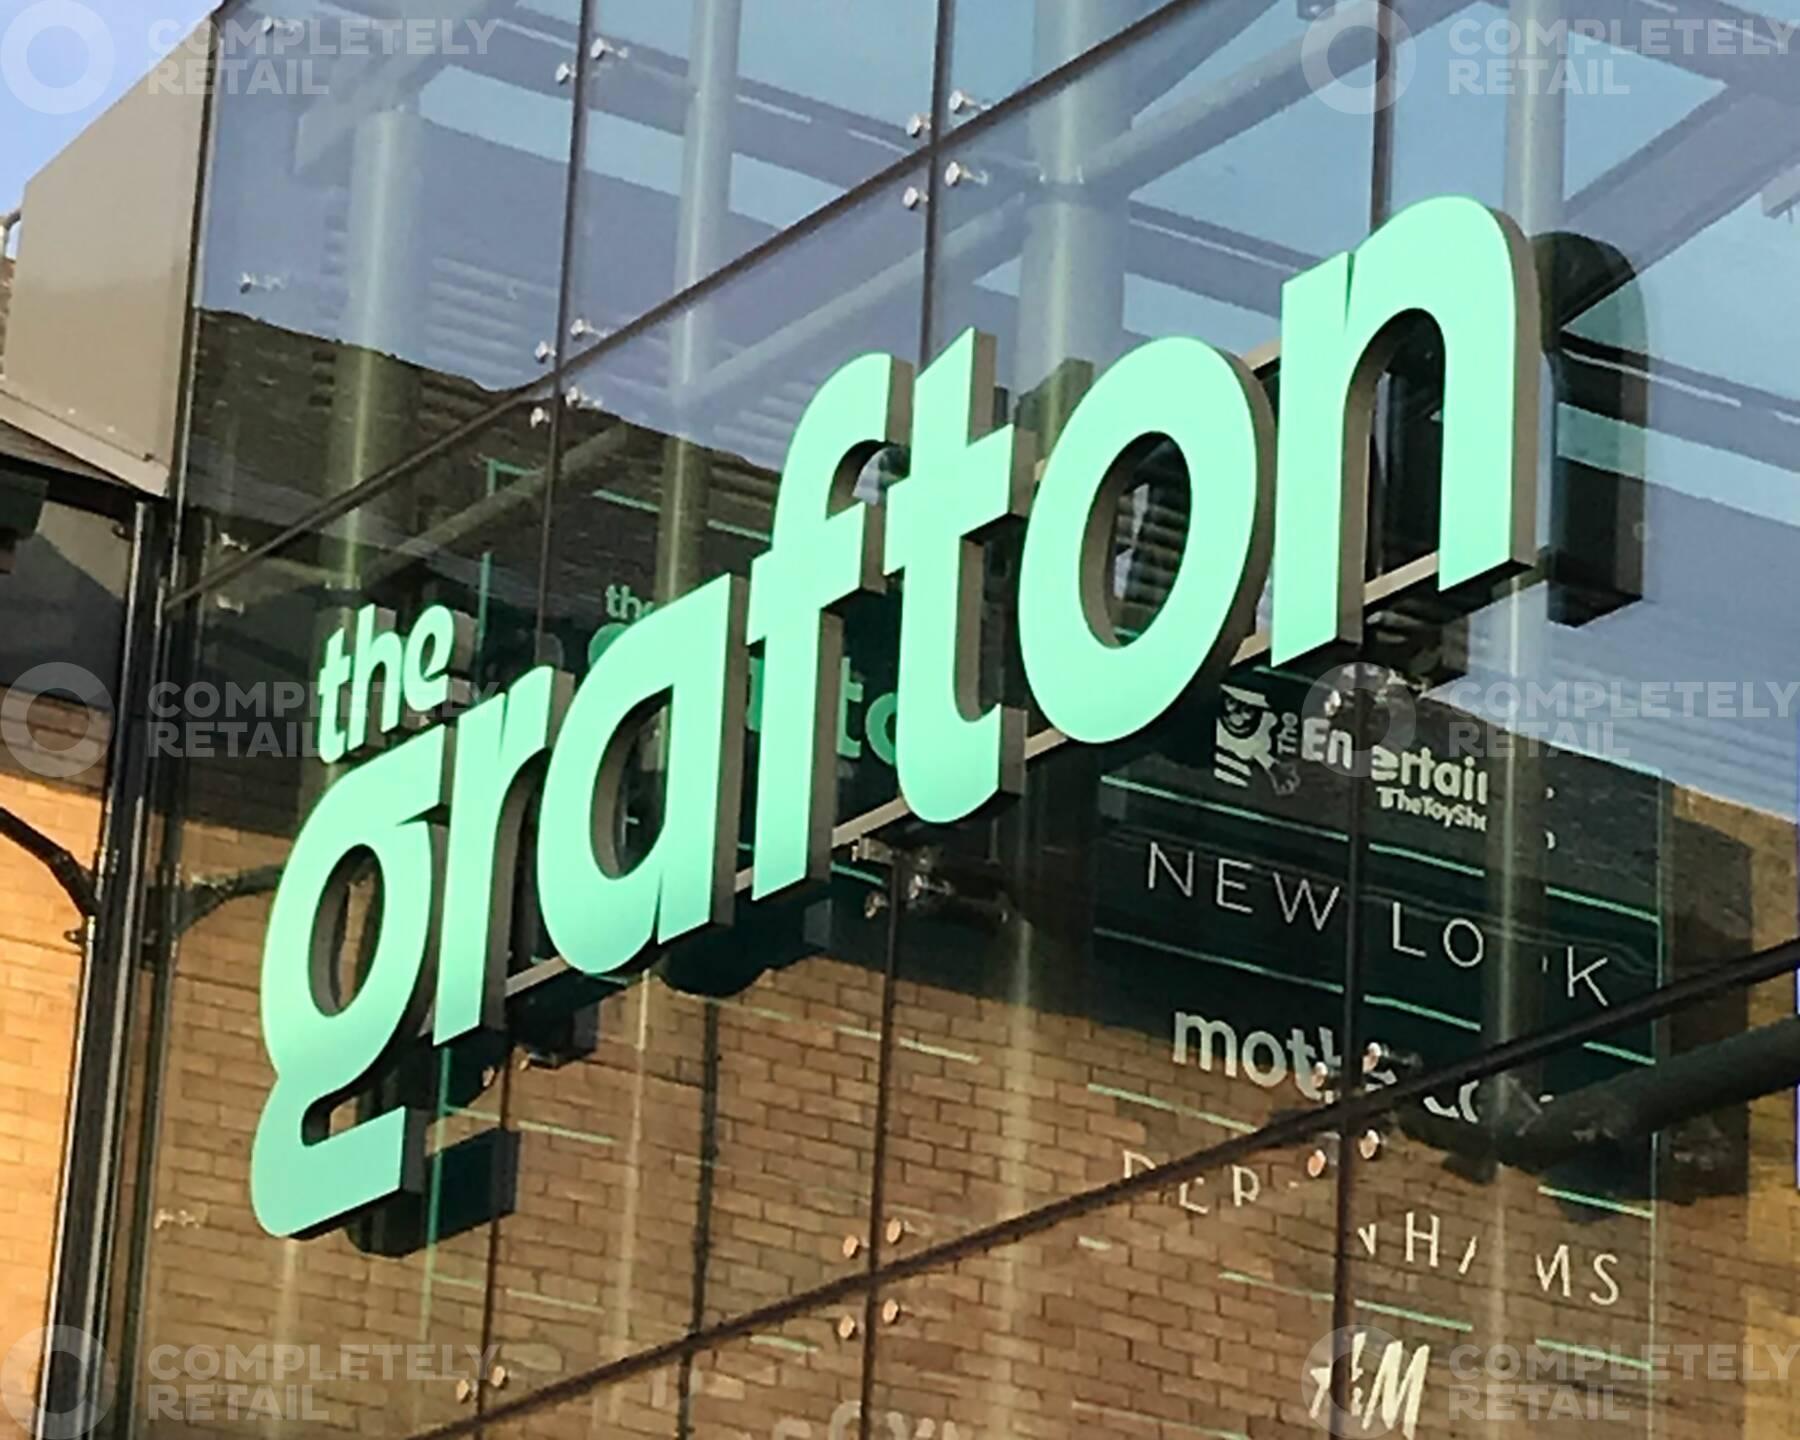 The Grafton